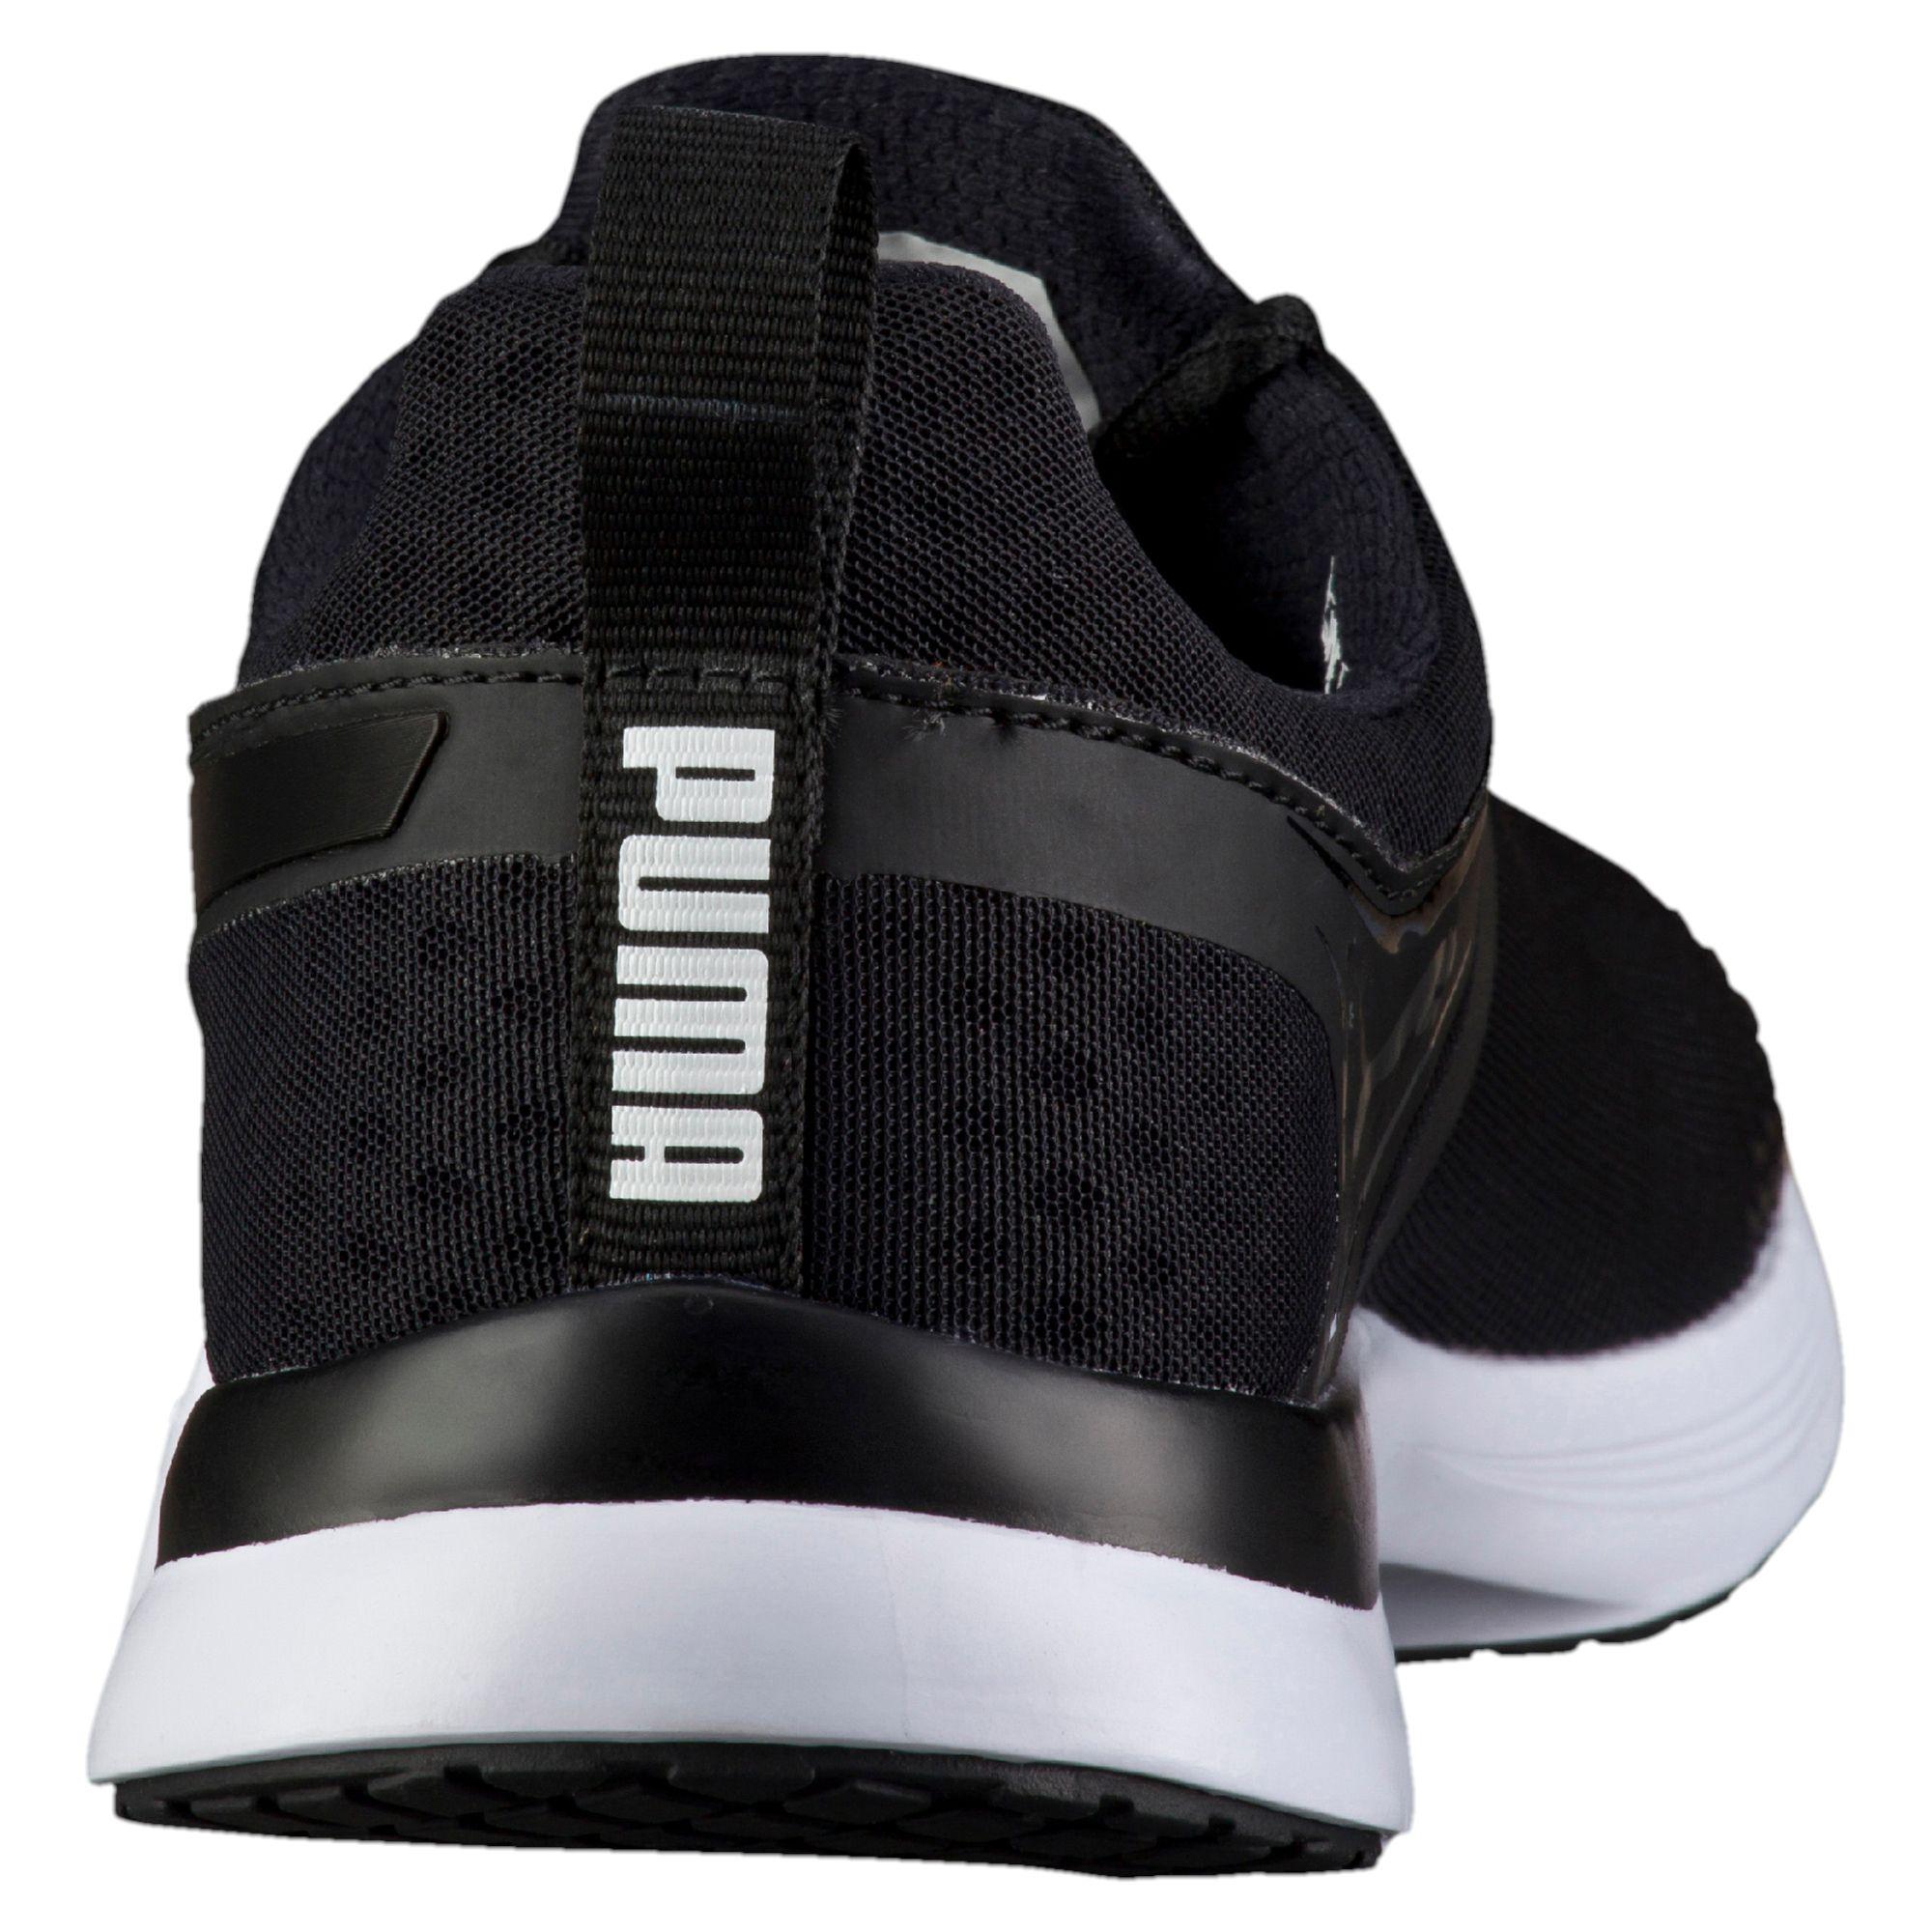 Xt New Damen Frauen D Schuhe Pulse 3 Training Fitness Puma bfyY6v7g